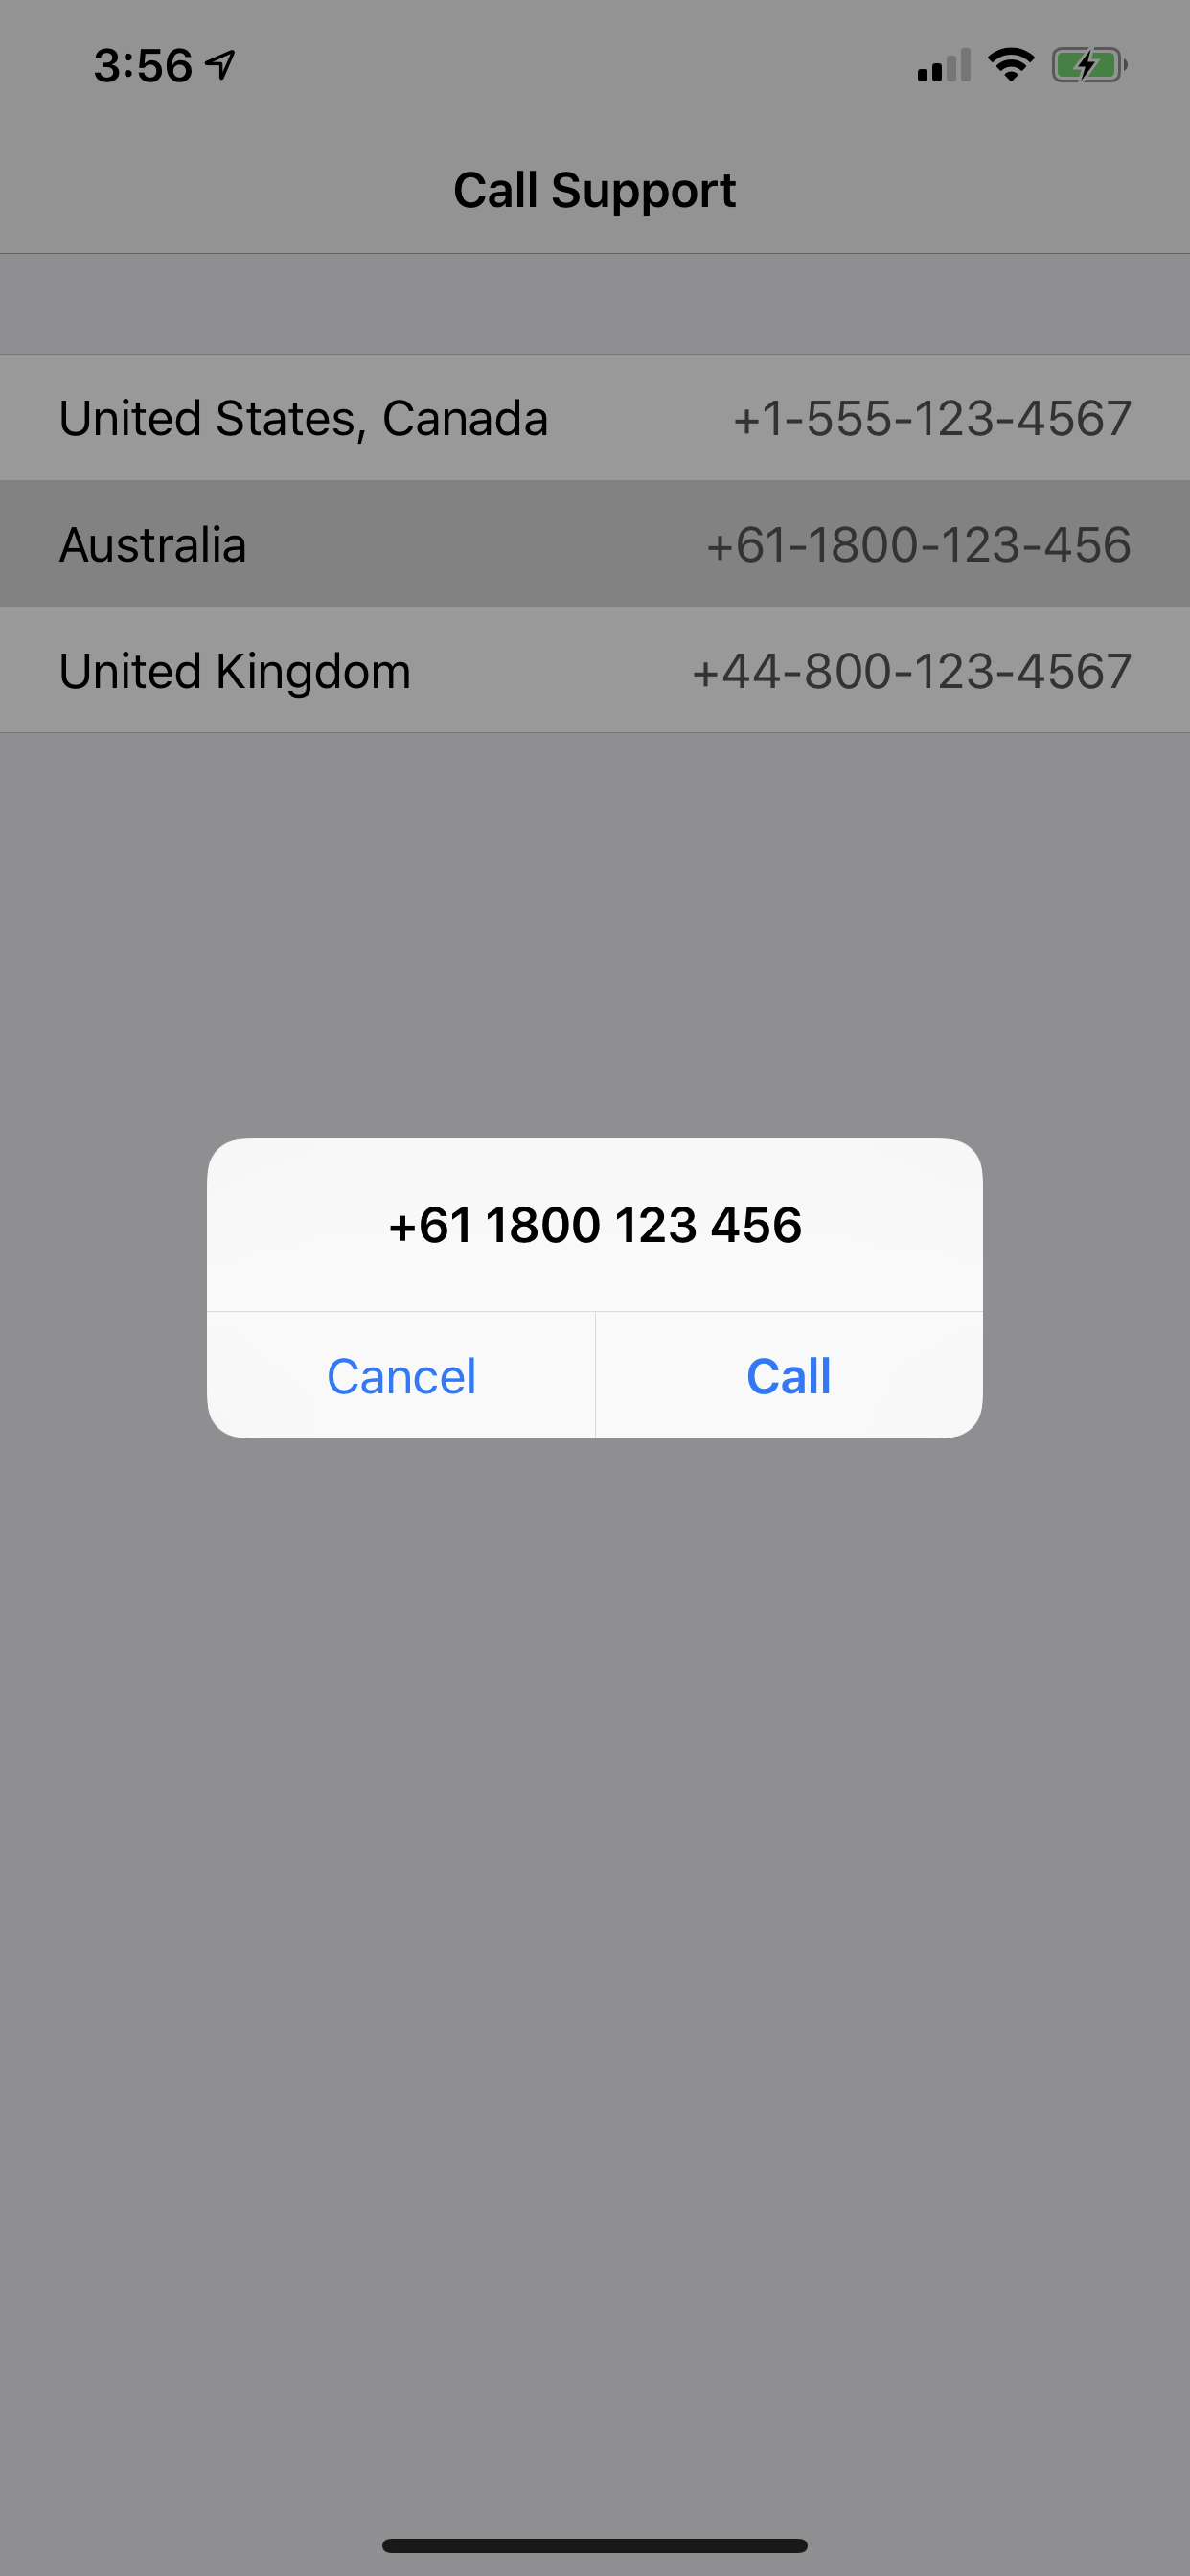 Strategies for opening phone URLs in iOS apps